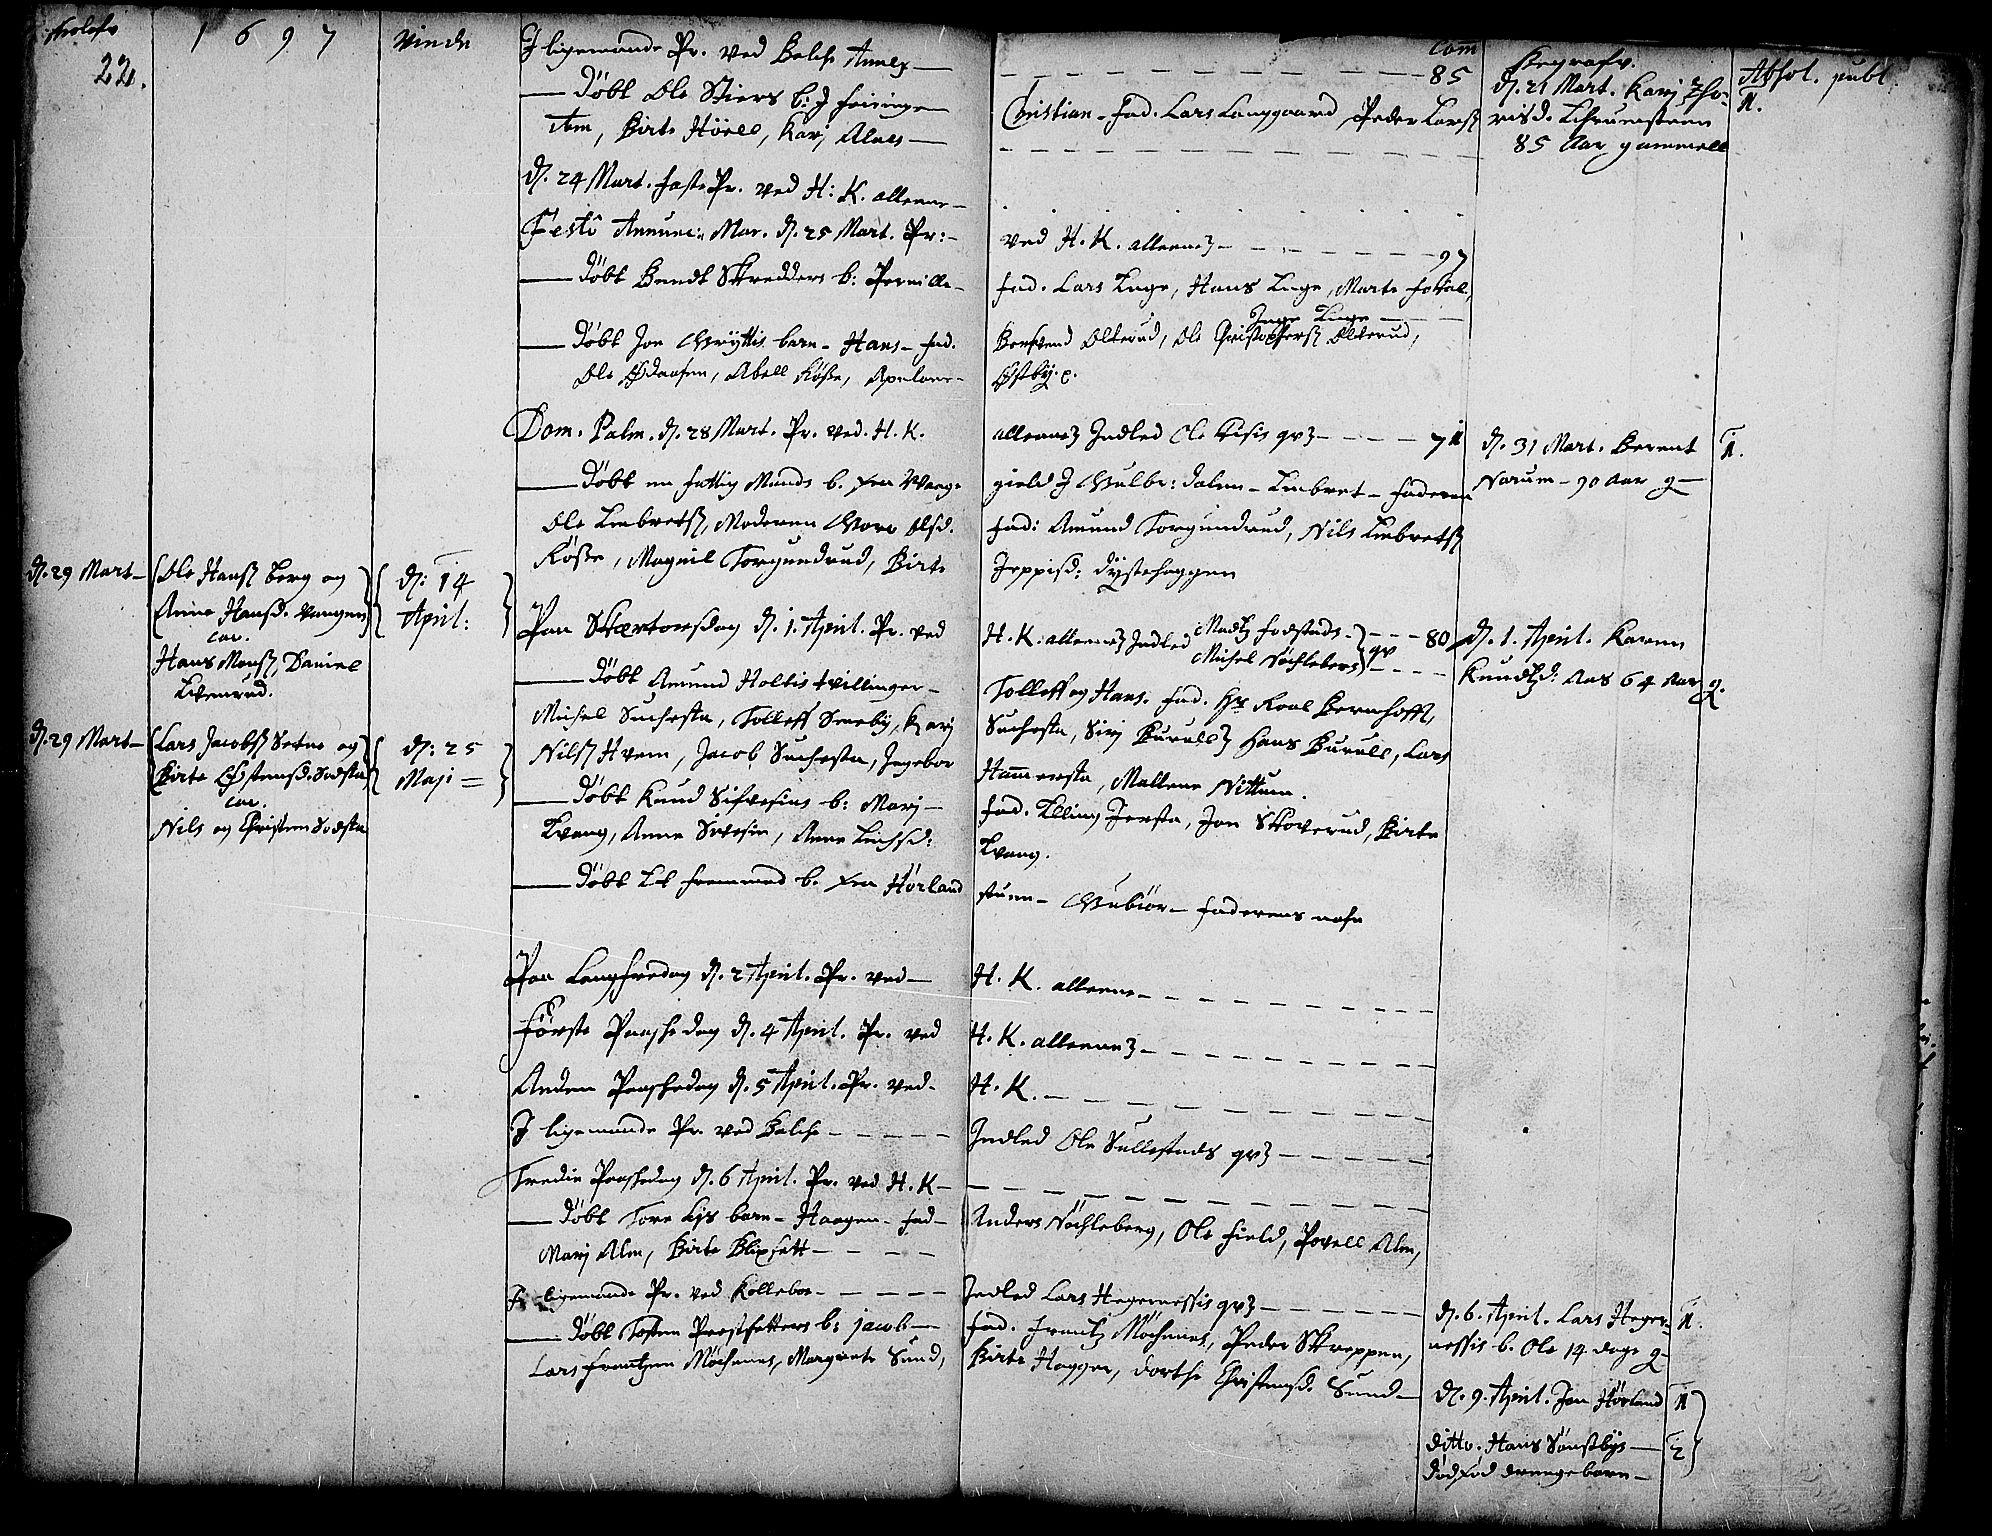 SAH, Toten prestekontor, Ministerialbok nr. 1, 1695-1713, s. 22